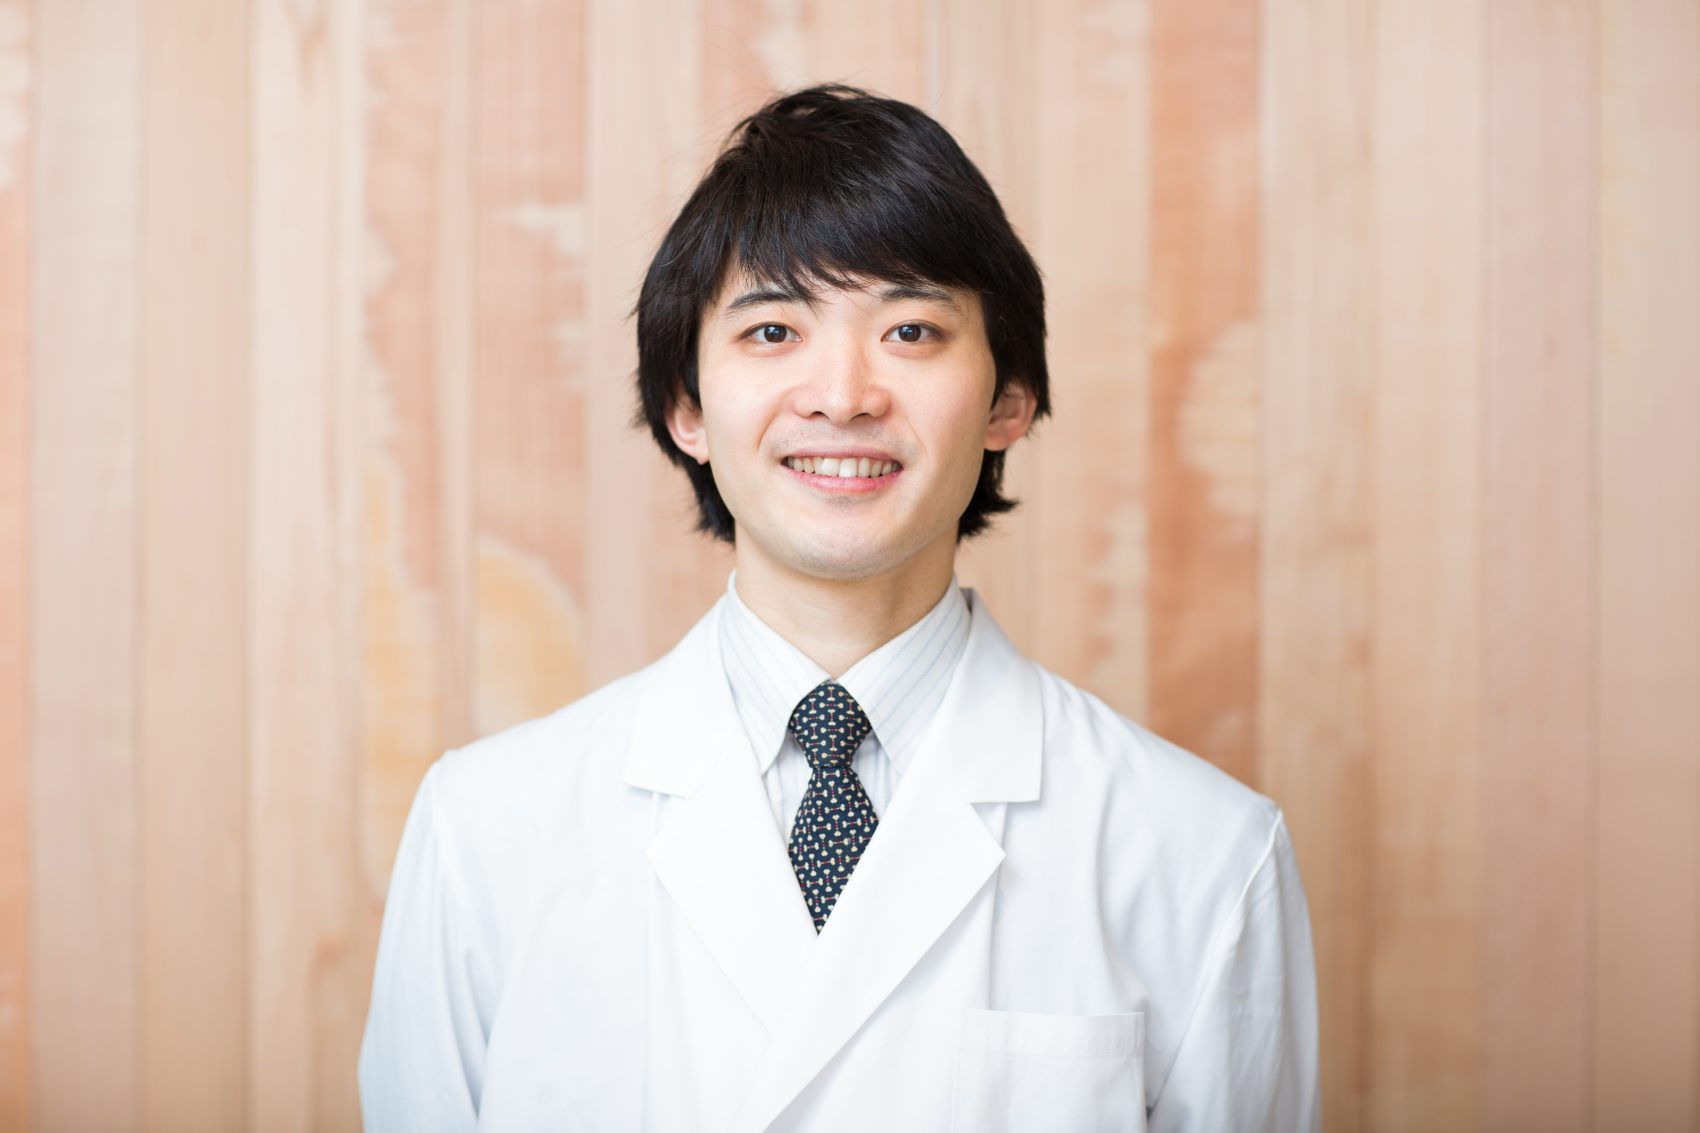 三上 貴浩 / Takahiro Mikami